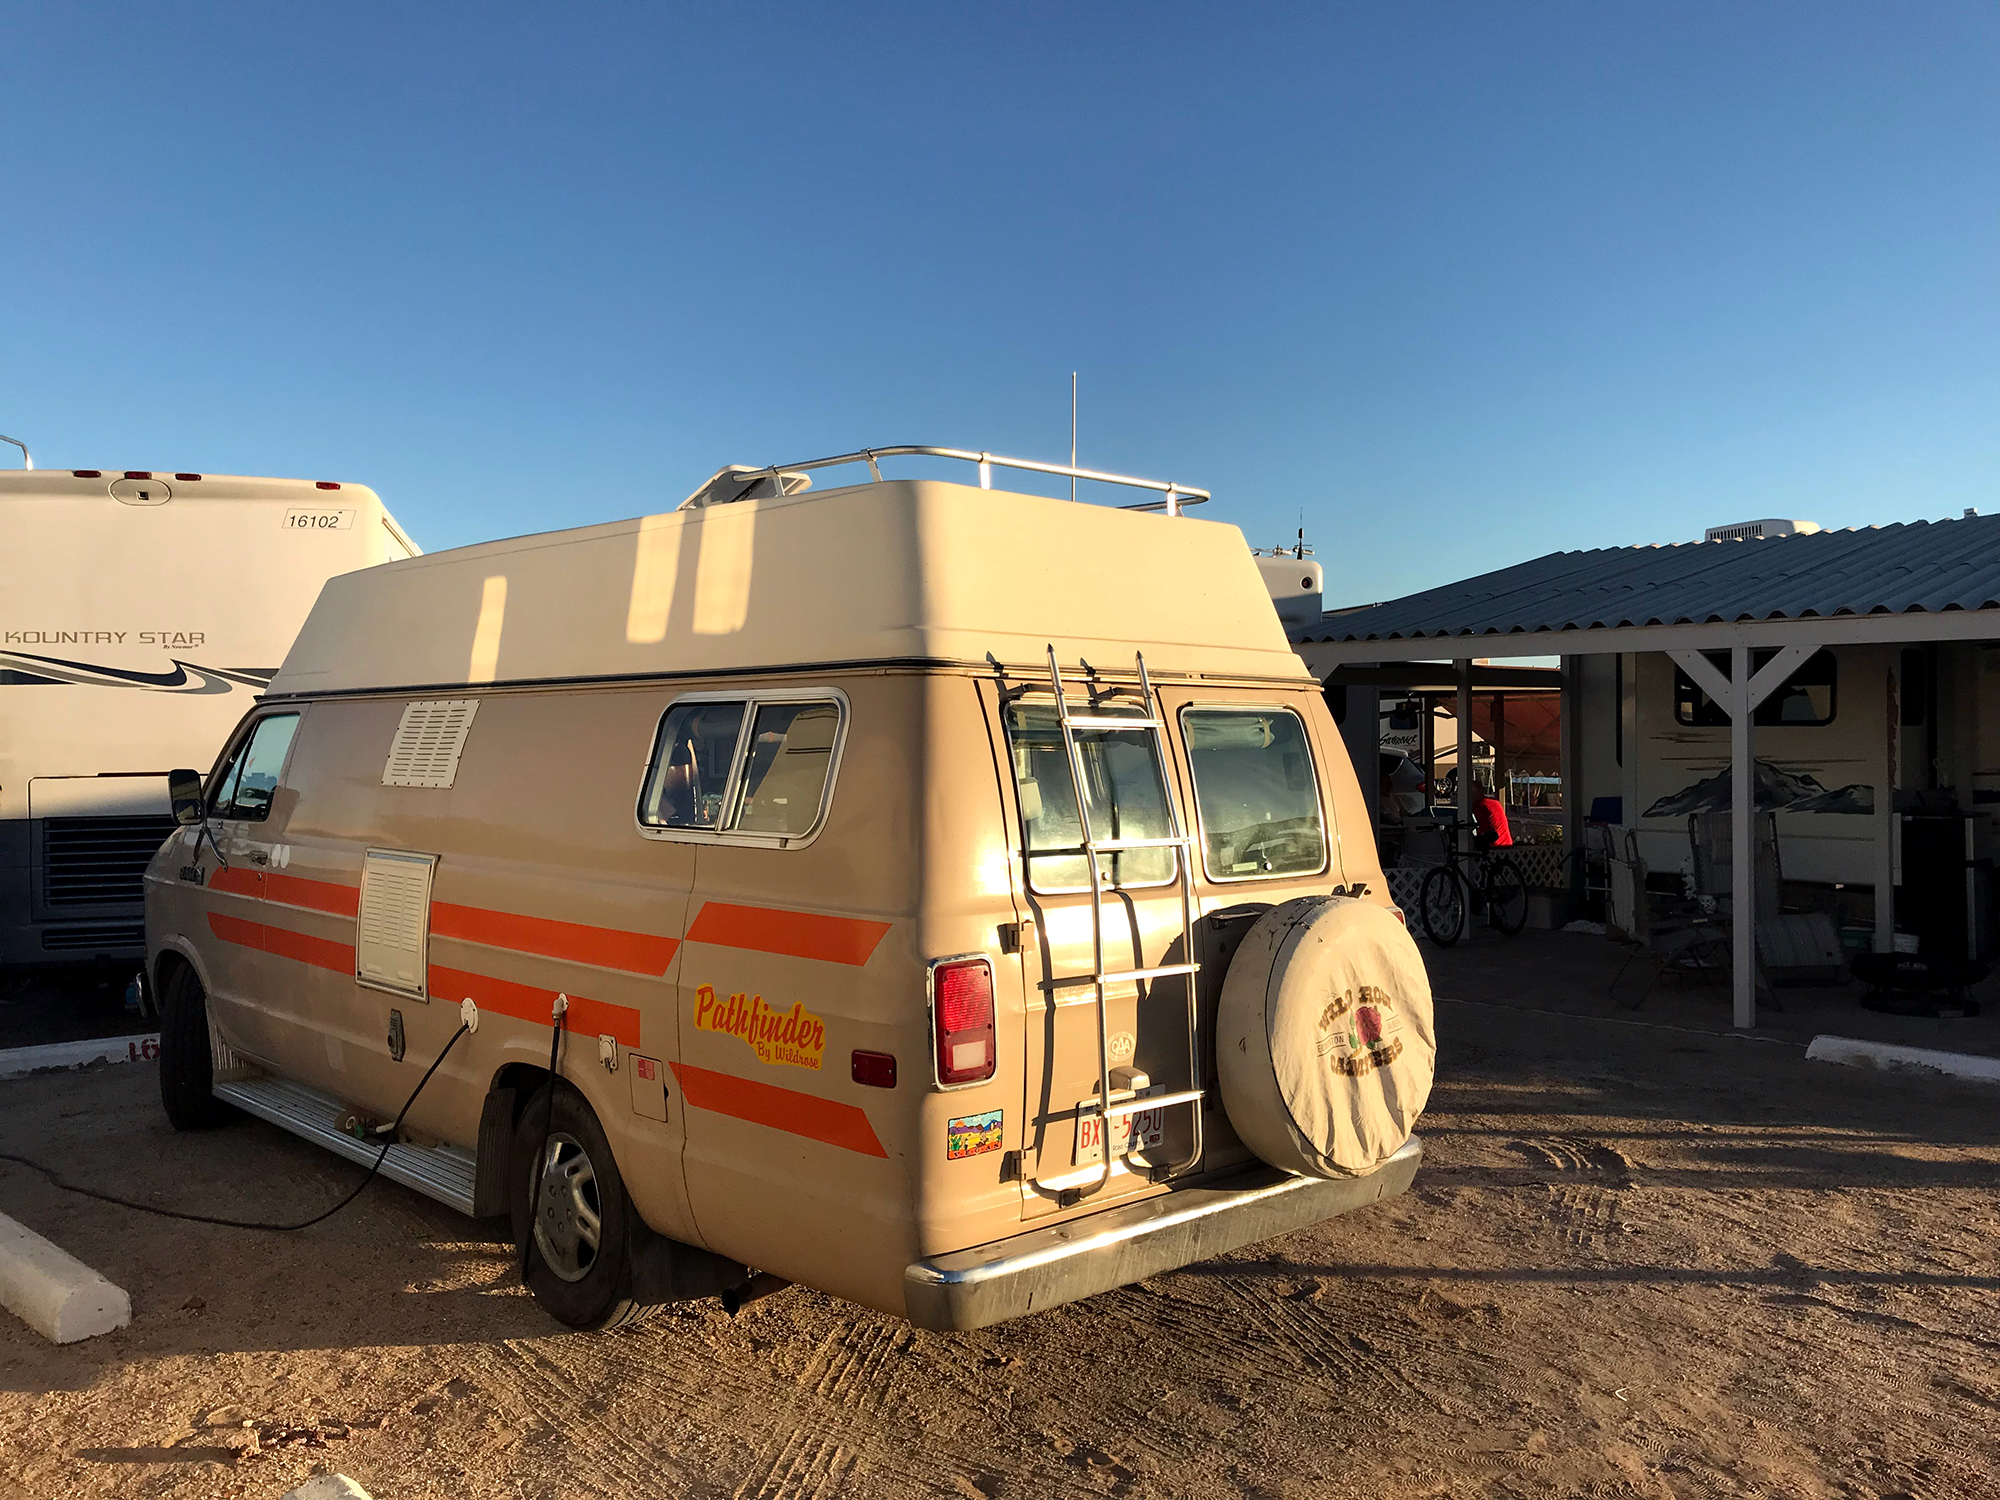 Generic Van Life - Puerto Penasco Playa Bonita RV Park